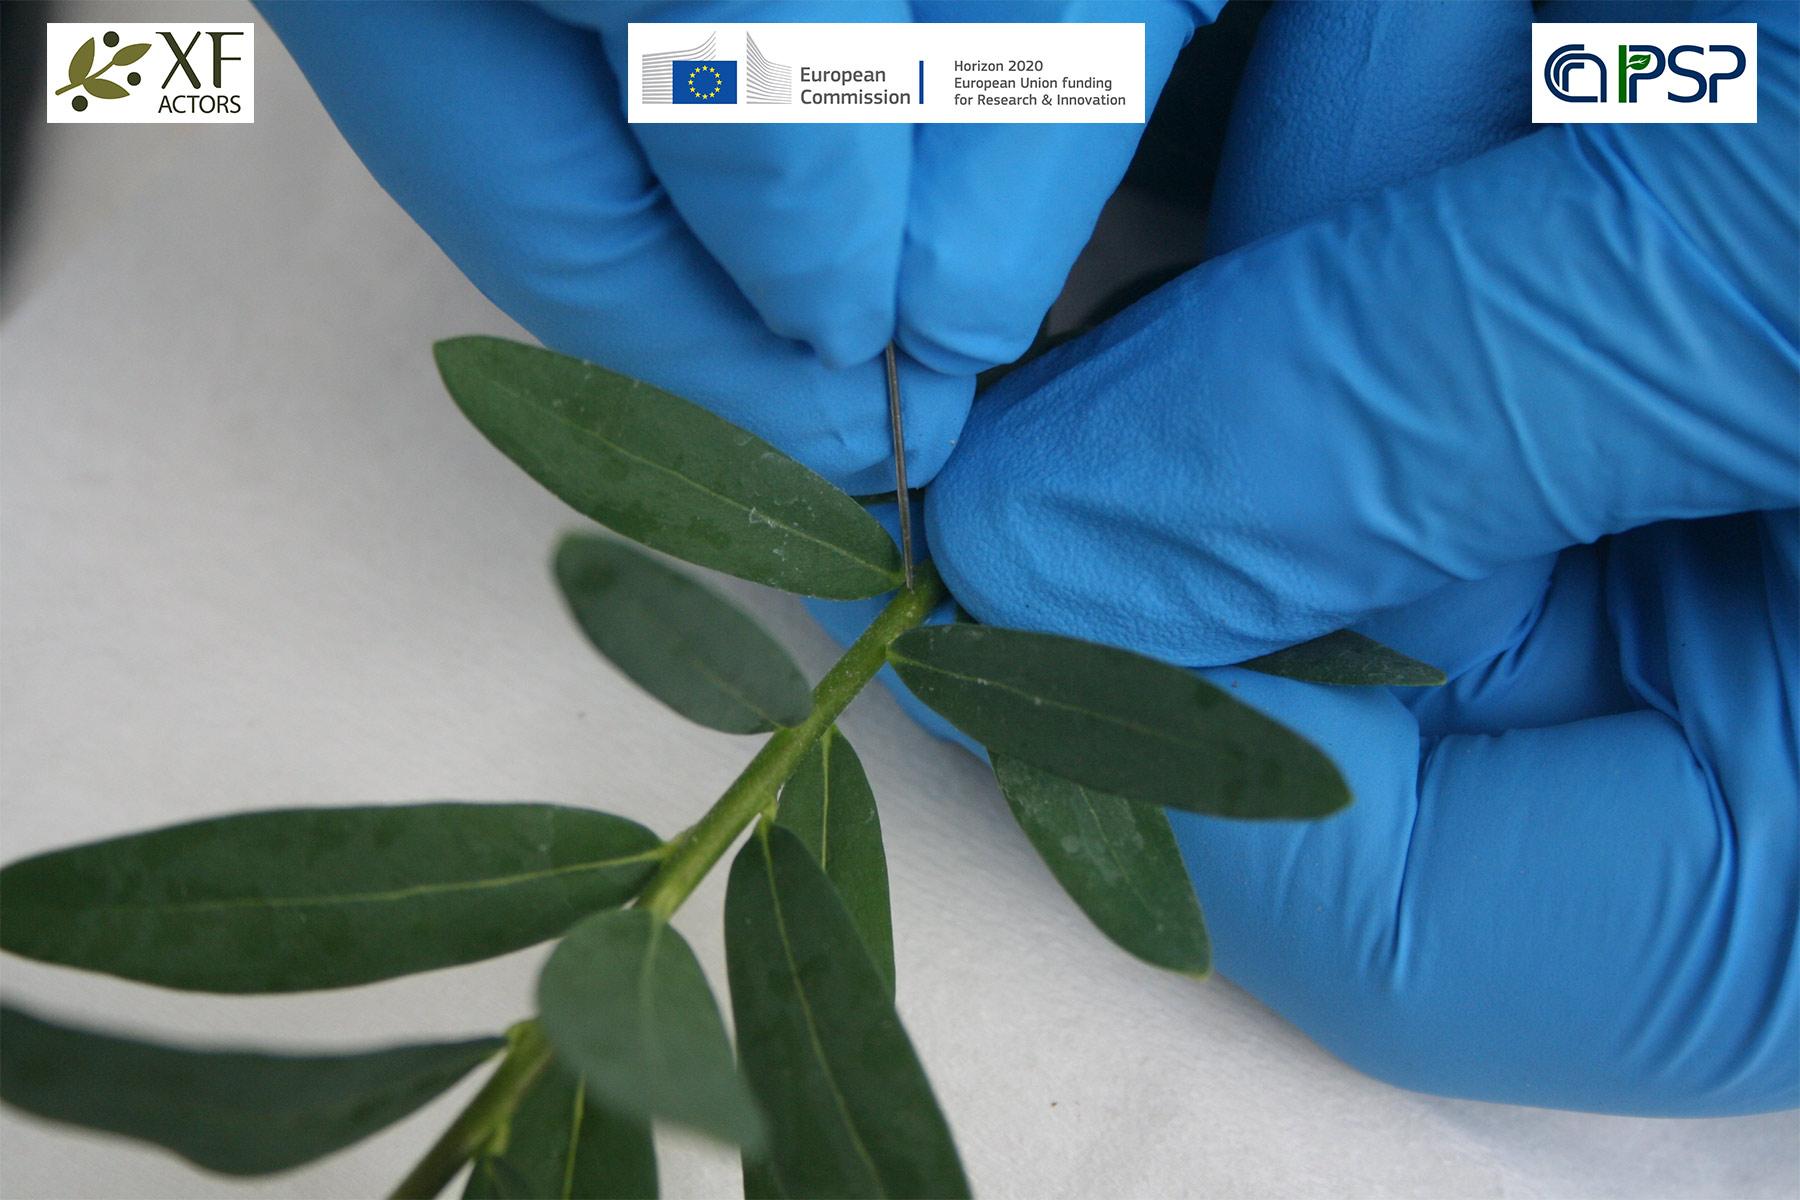 14 - inoculation Xf in Polygala myrtifolia